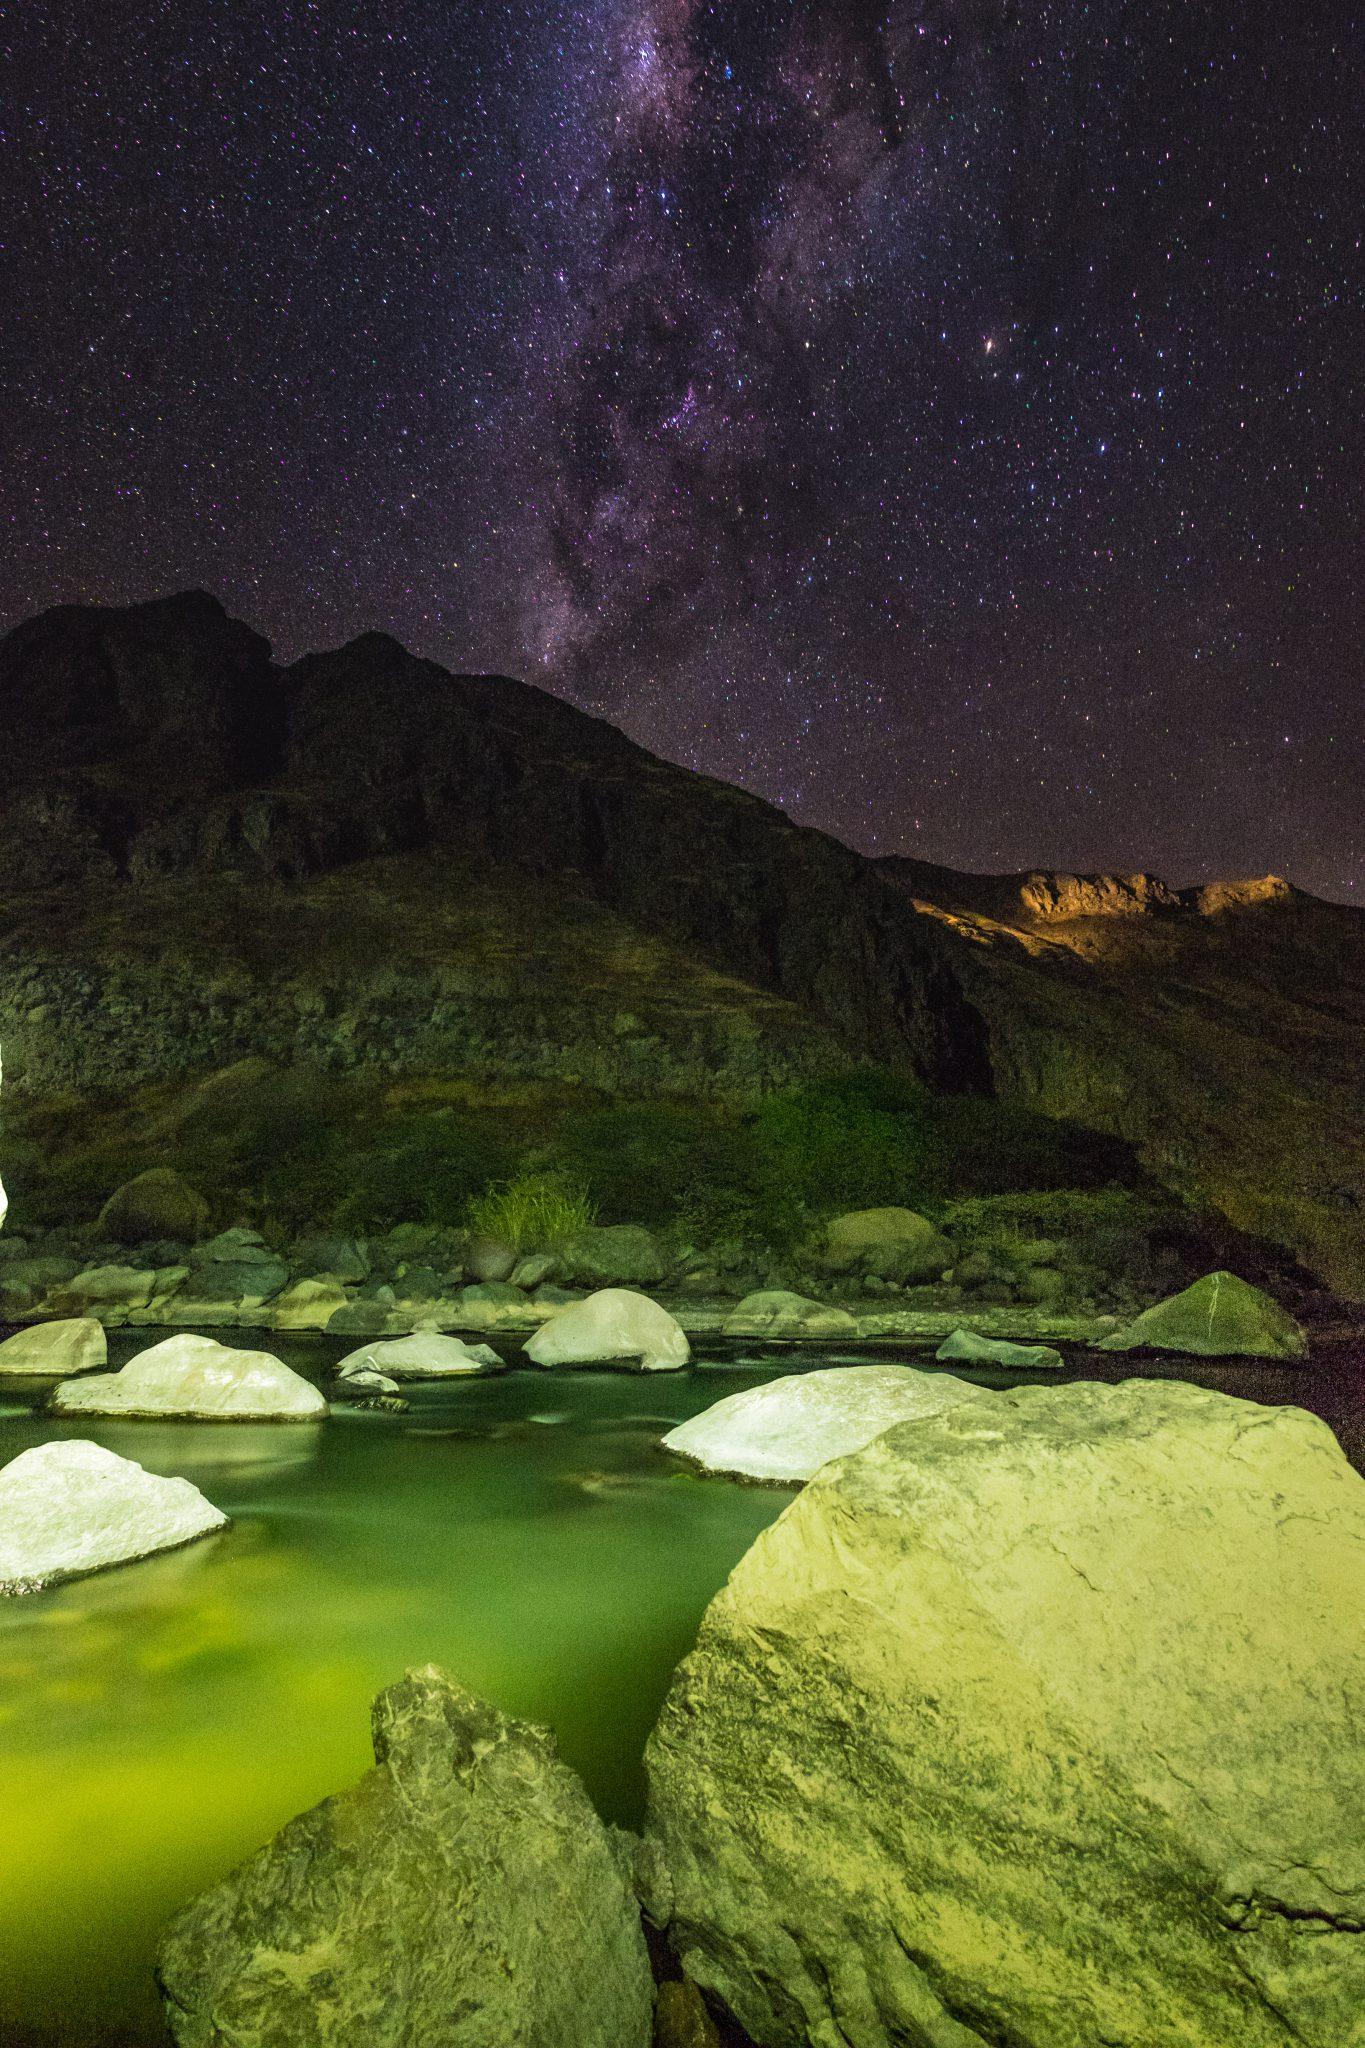 Colca Canyon trek - Llahuar Lodge and river by night.